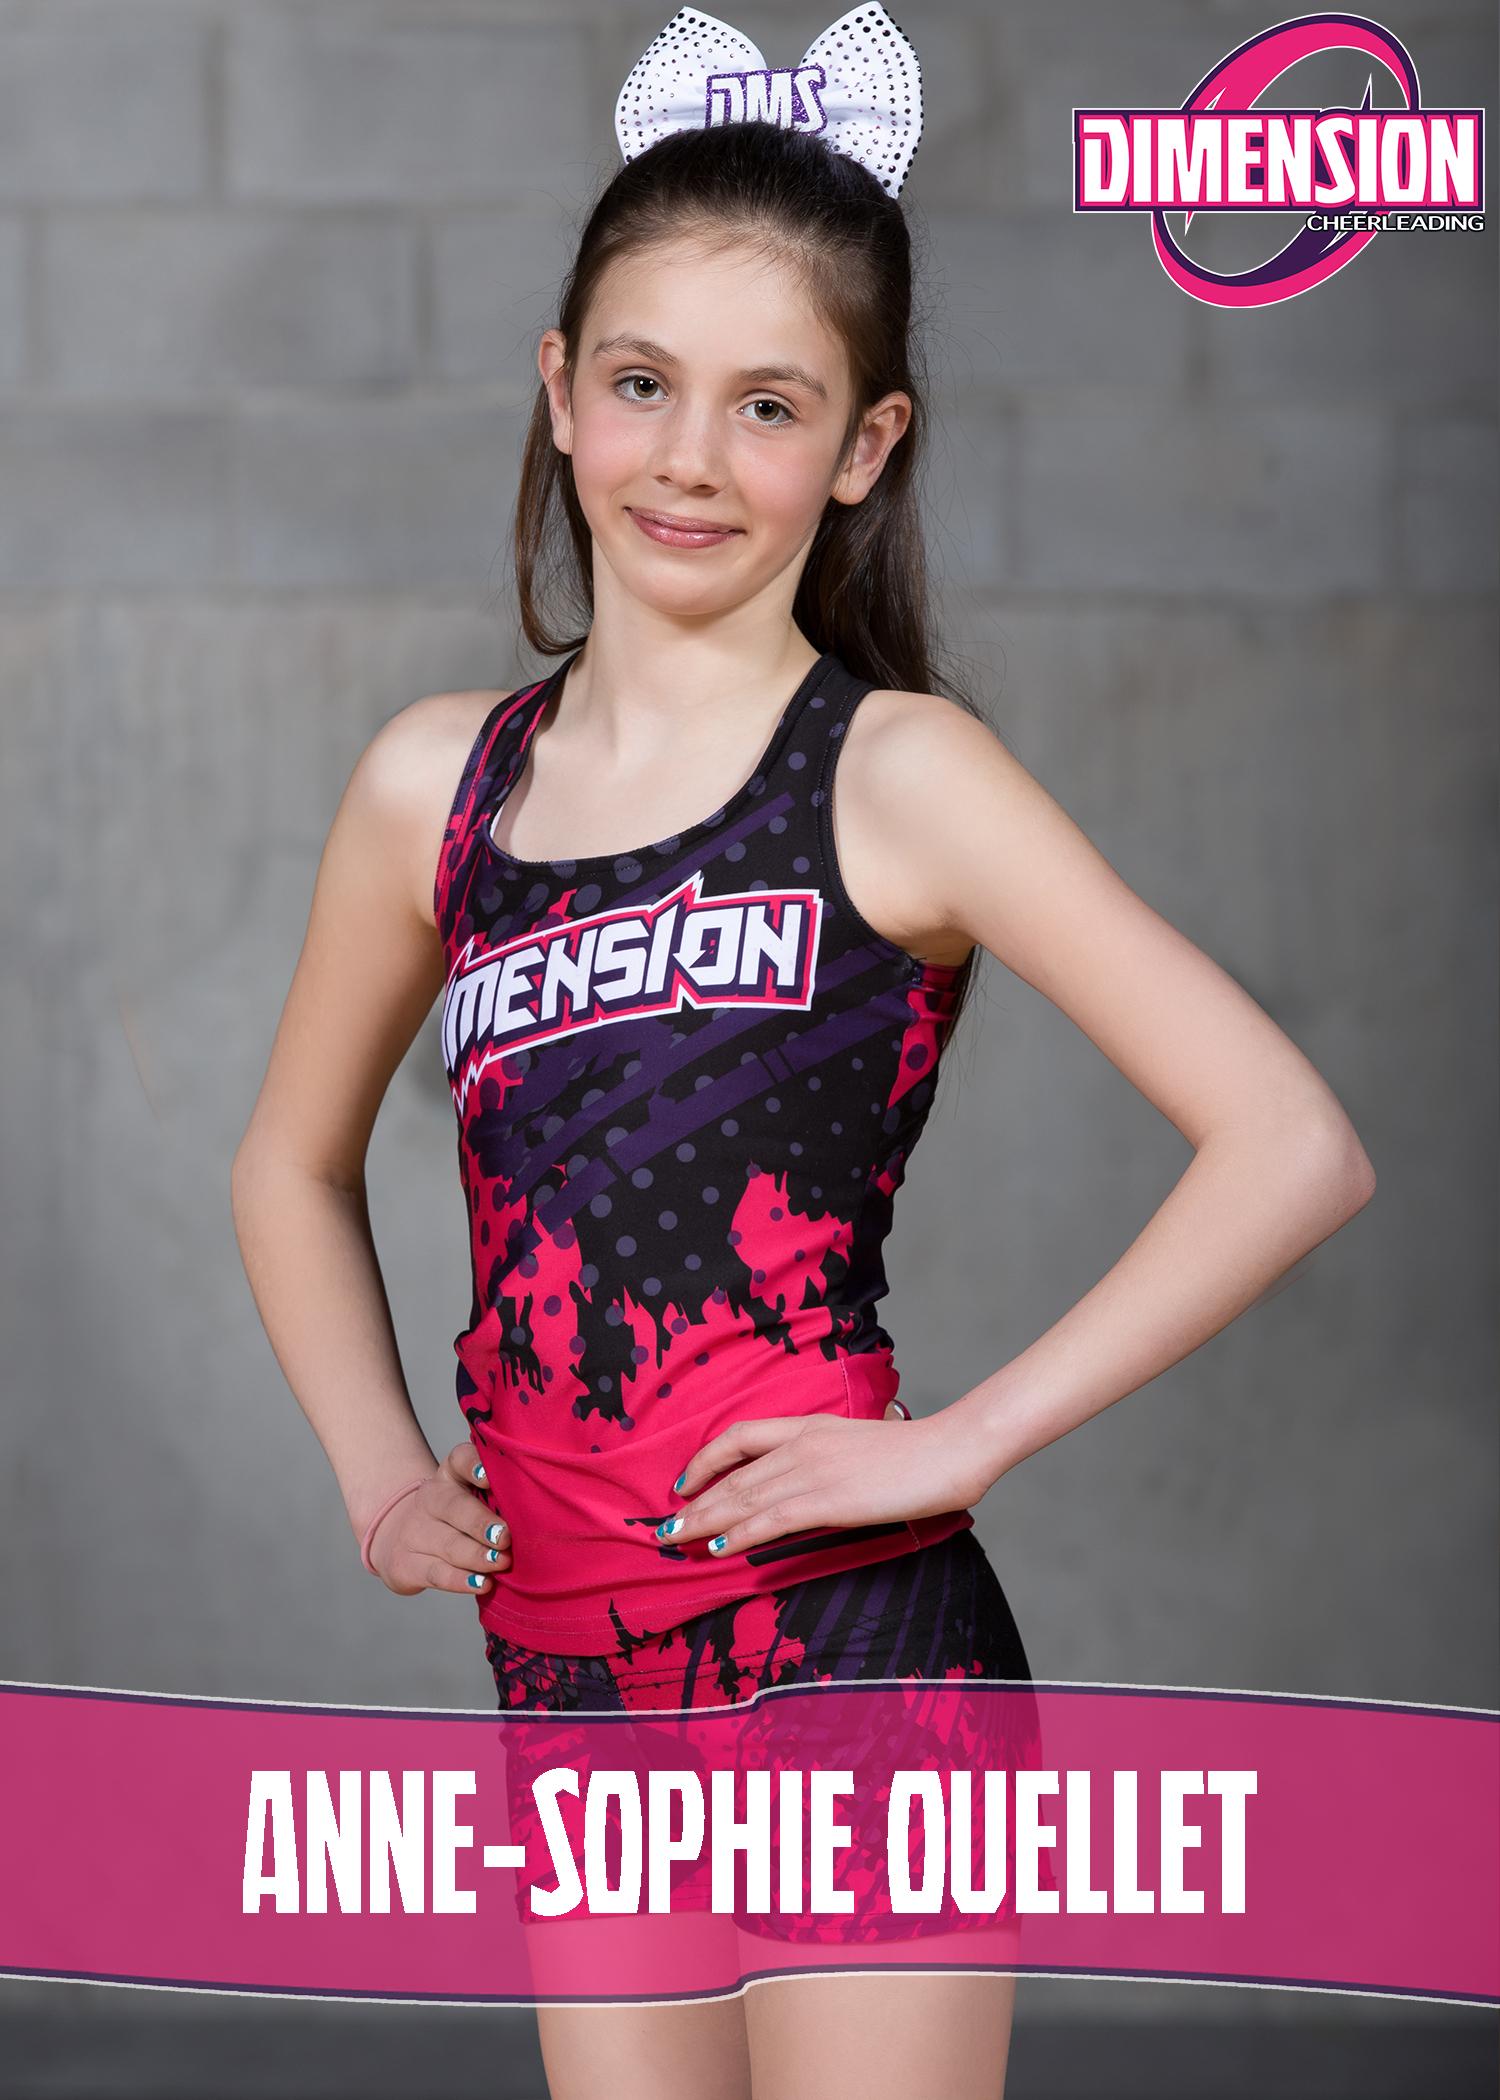 Anne-Sophie Ouellet